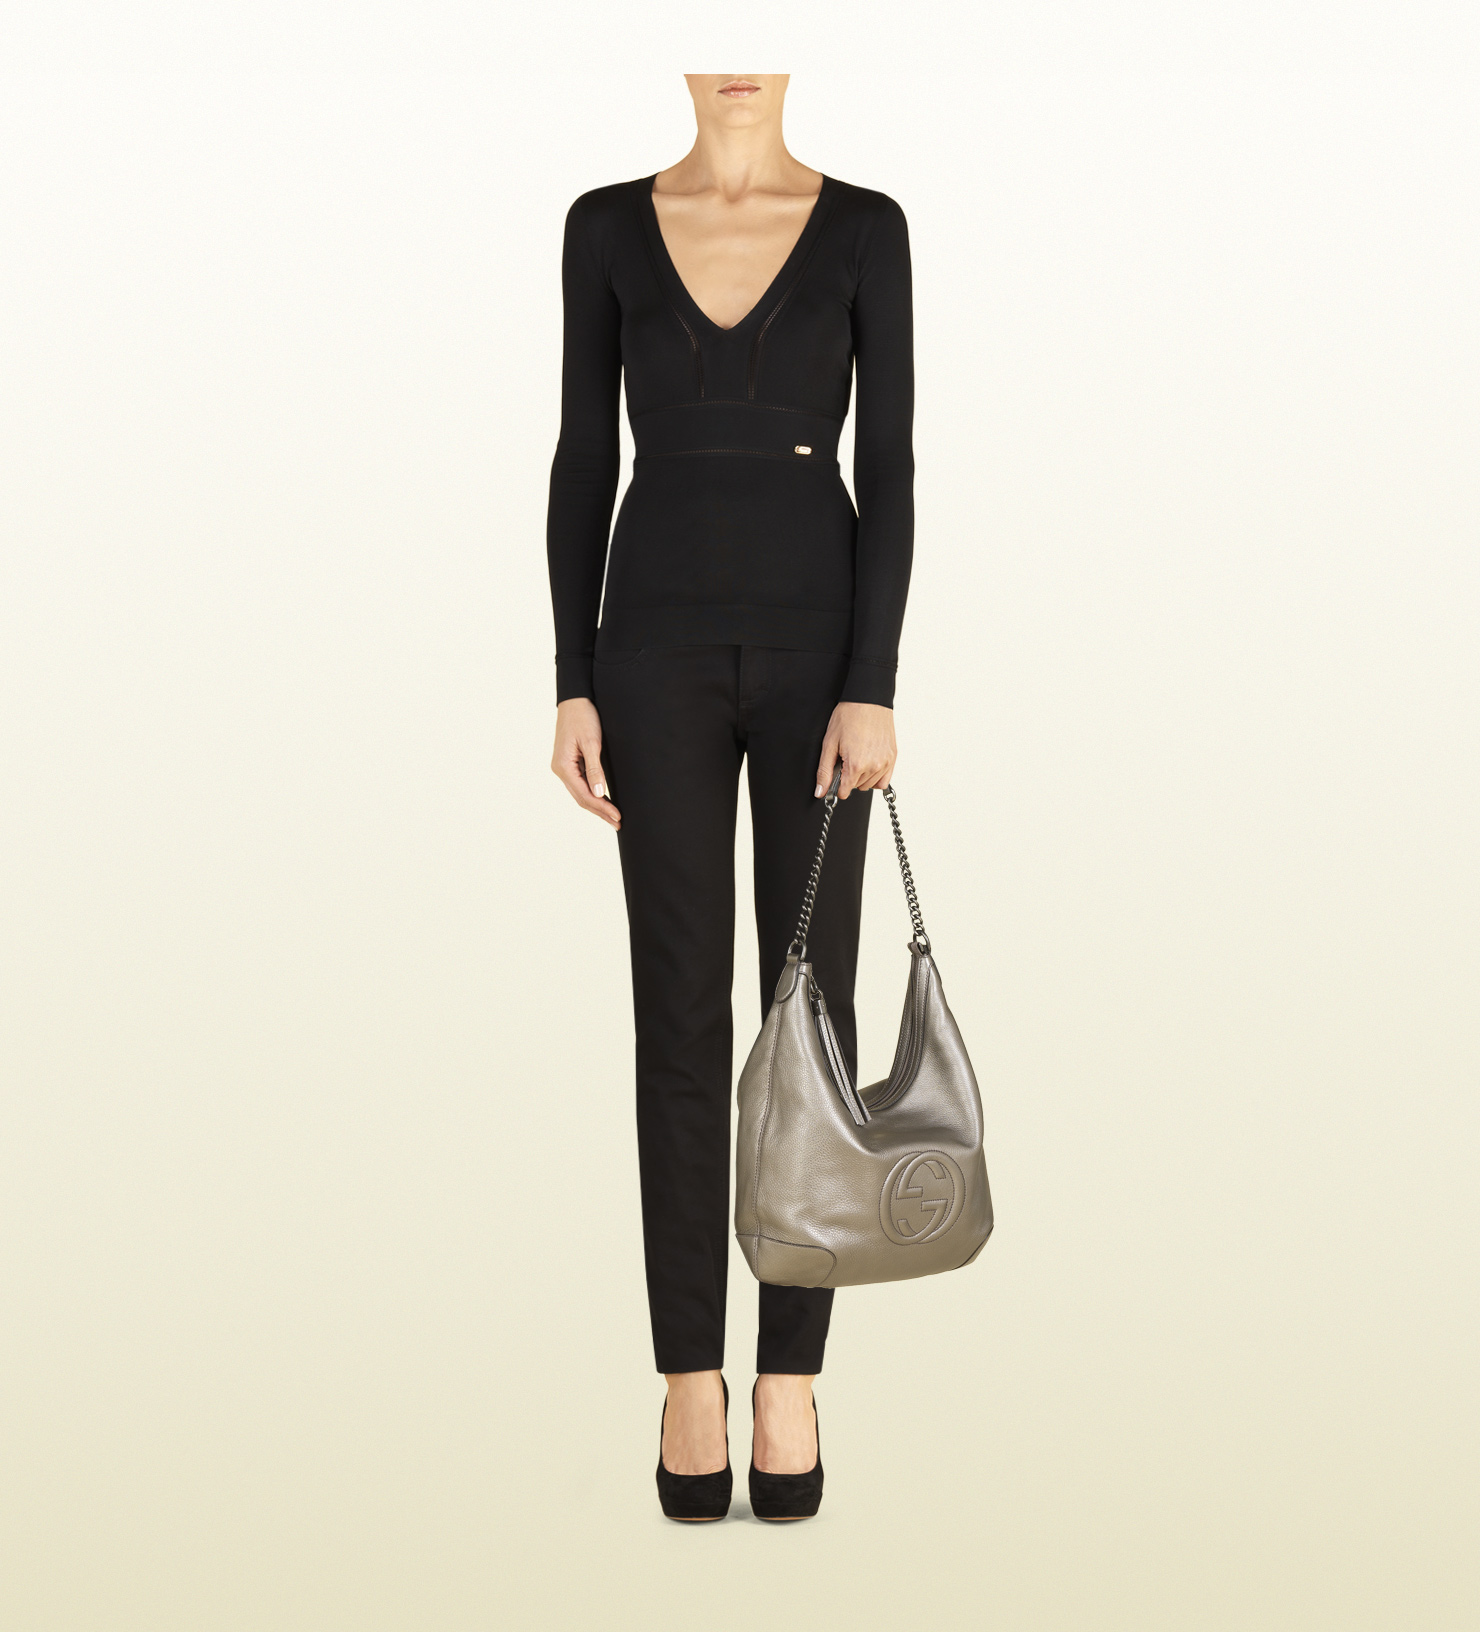 ad799e99912f0 Lyst - Gucci Soho Metallic Leather Chain Shoulder Bag in Gray